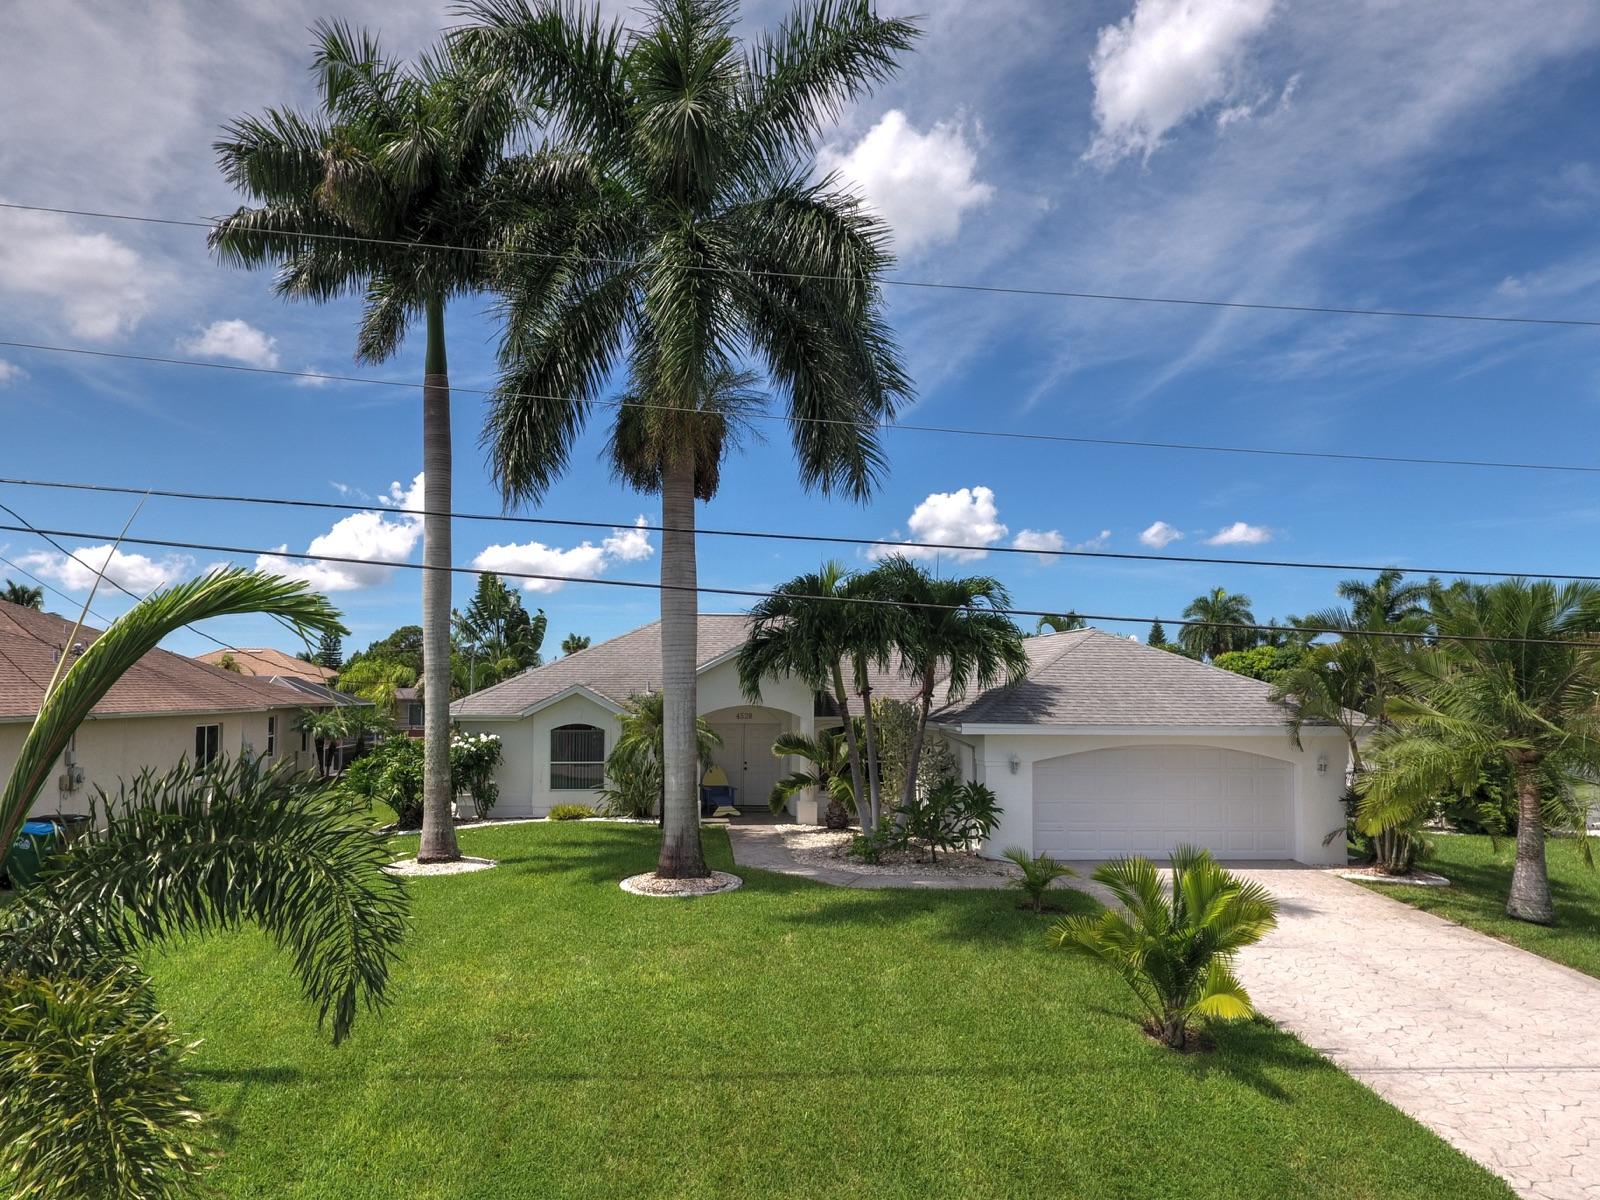 Ferienhaus Ferienvilla Cape Coral Florida Vacation Holiday   Florida ...